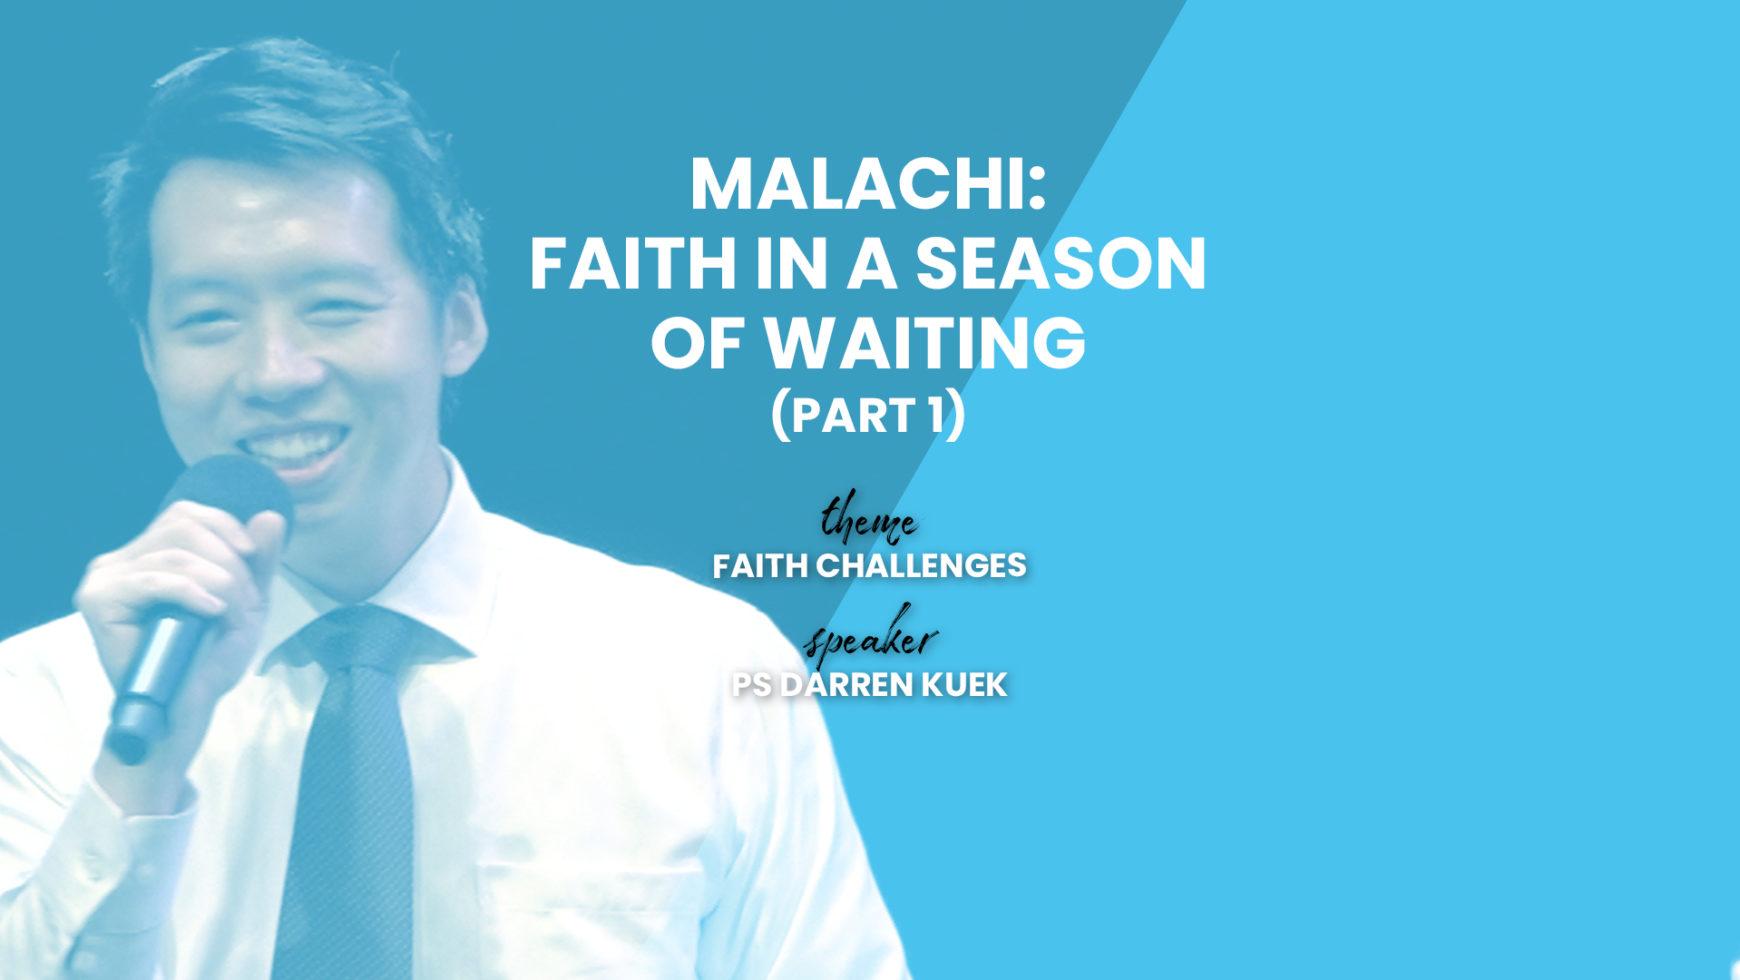 Malachi: Faith In A Season Of Waiting Part 1